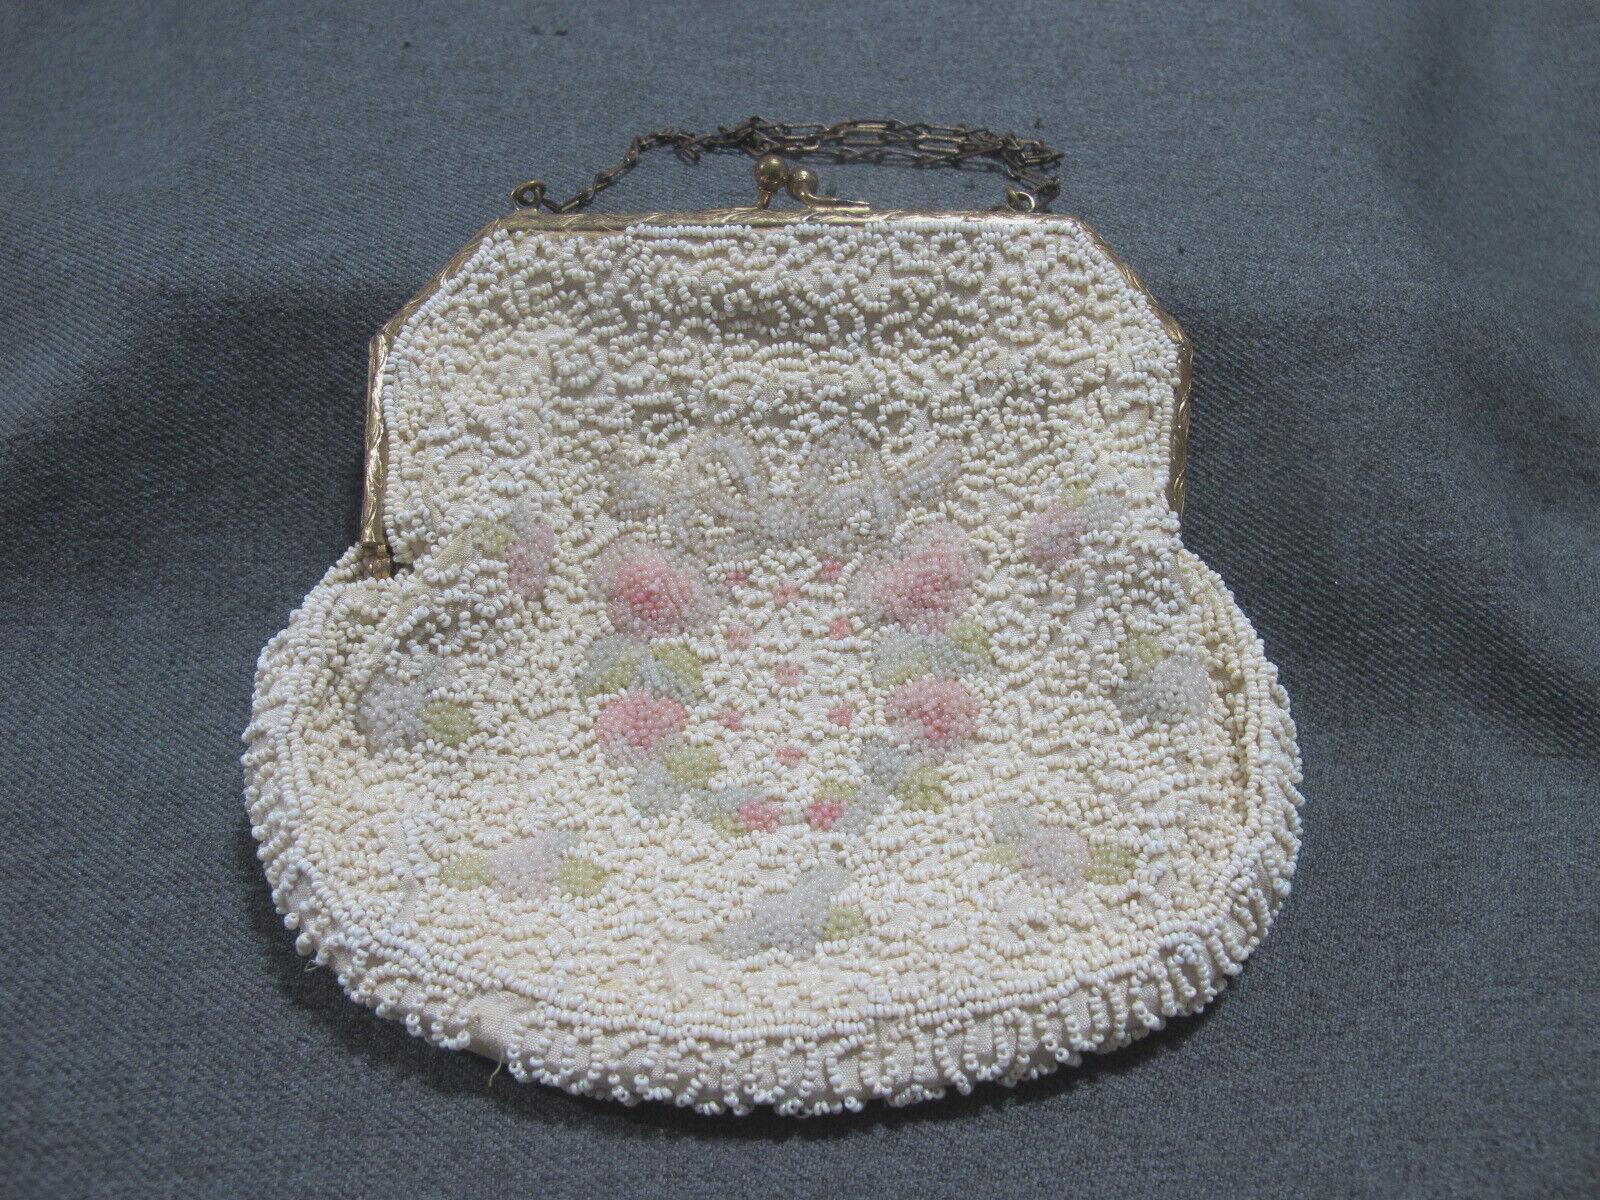 Antique Longchamps France flowers bow wreath microbeaded goldtone frame purse